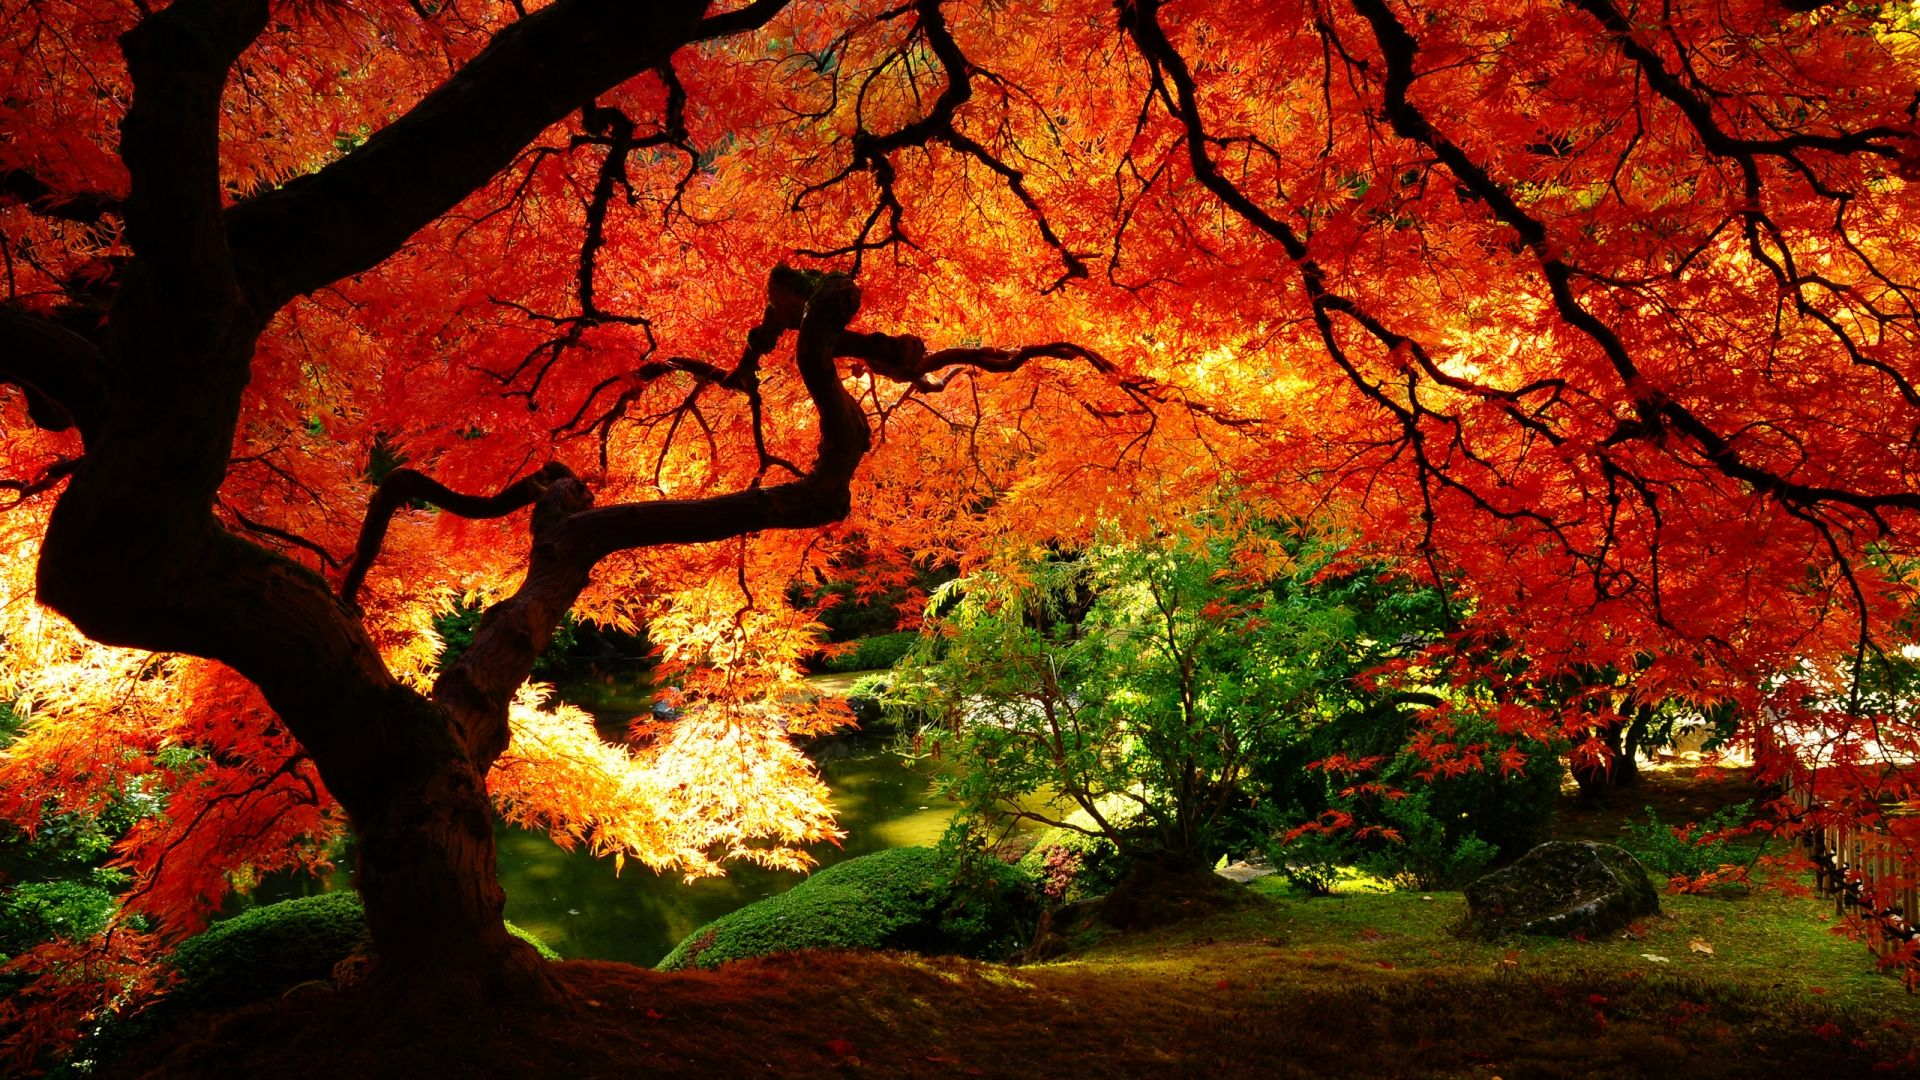 Hd Wallpaper Nature Fall Hd Widescreen 11 HD Wallpapers